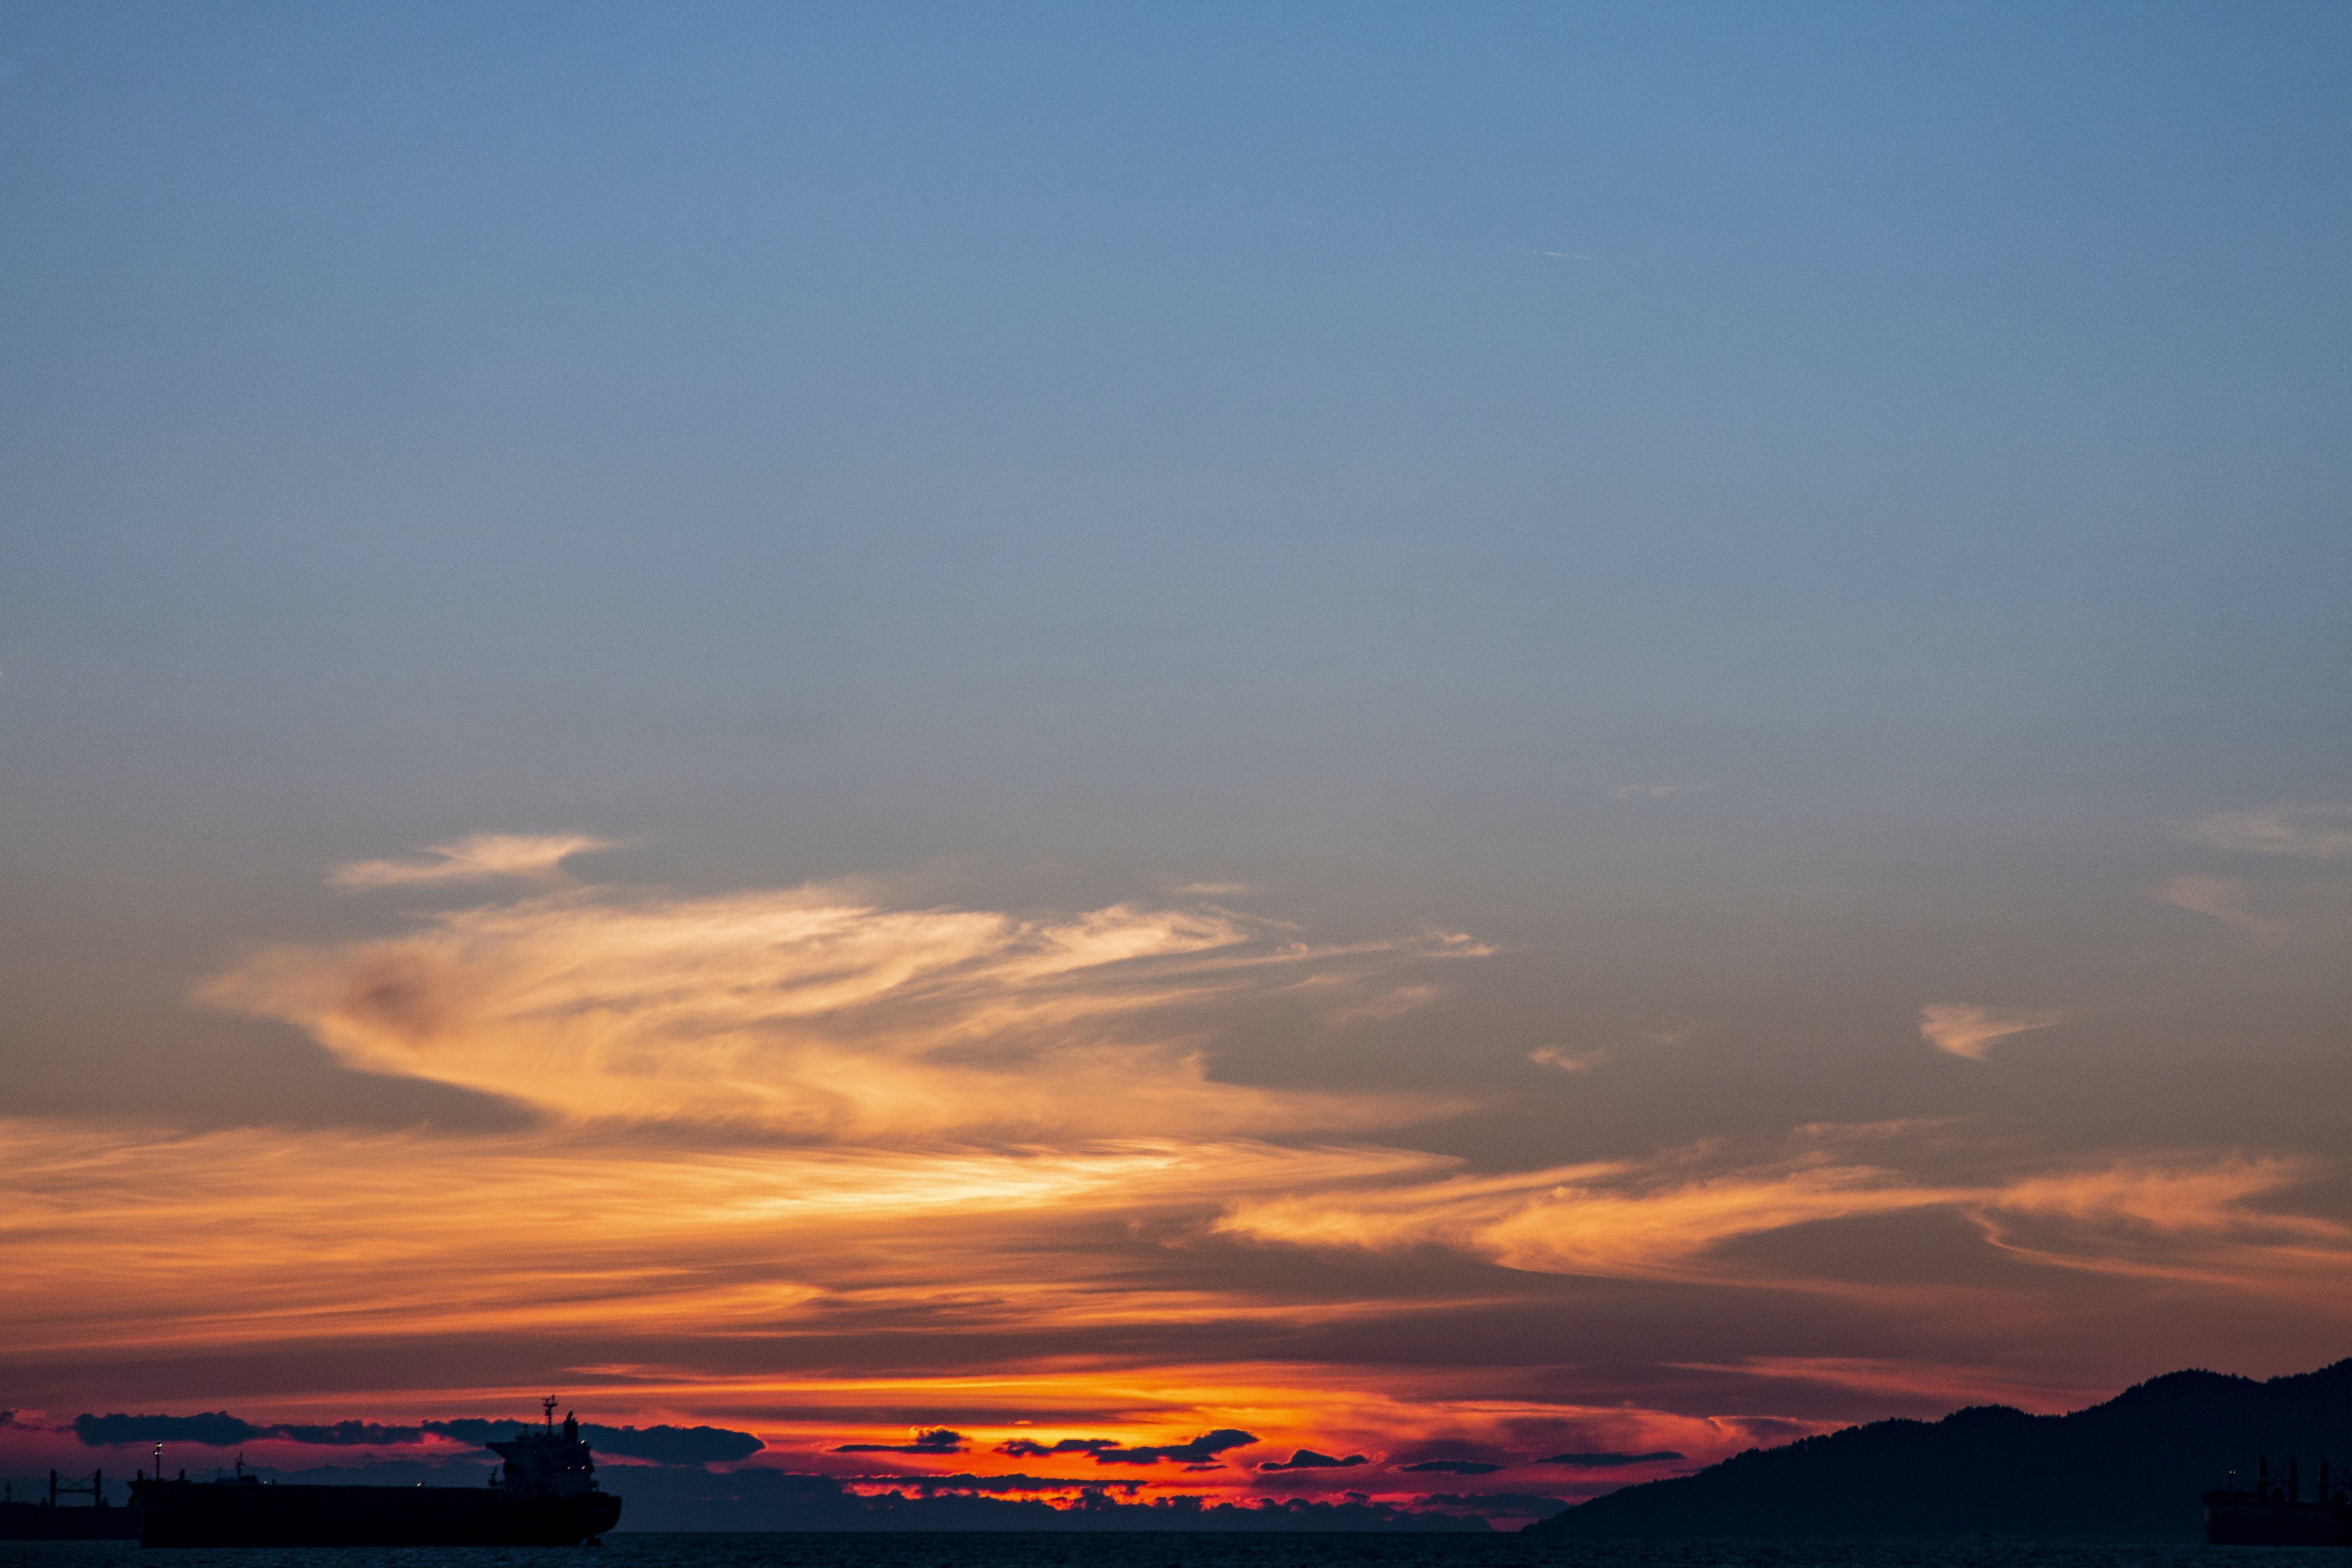 Free stock photo of sky, sunset, beach, clouds